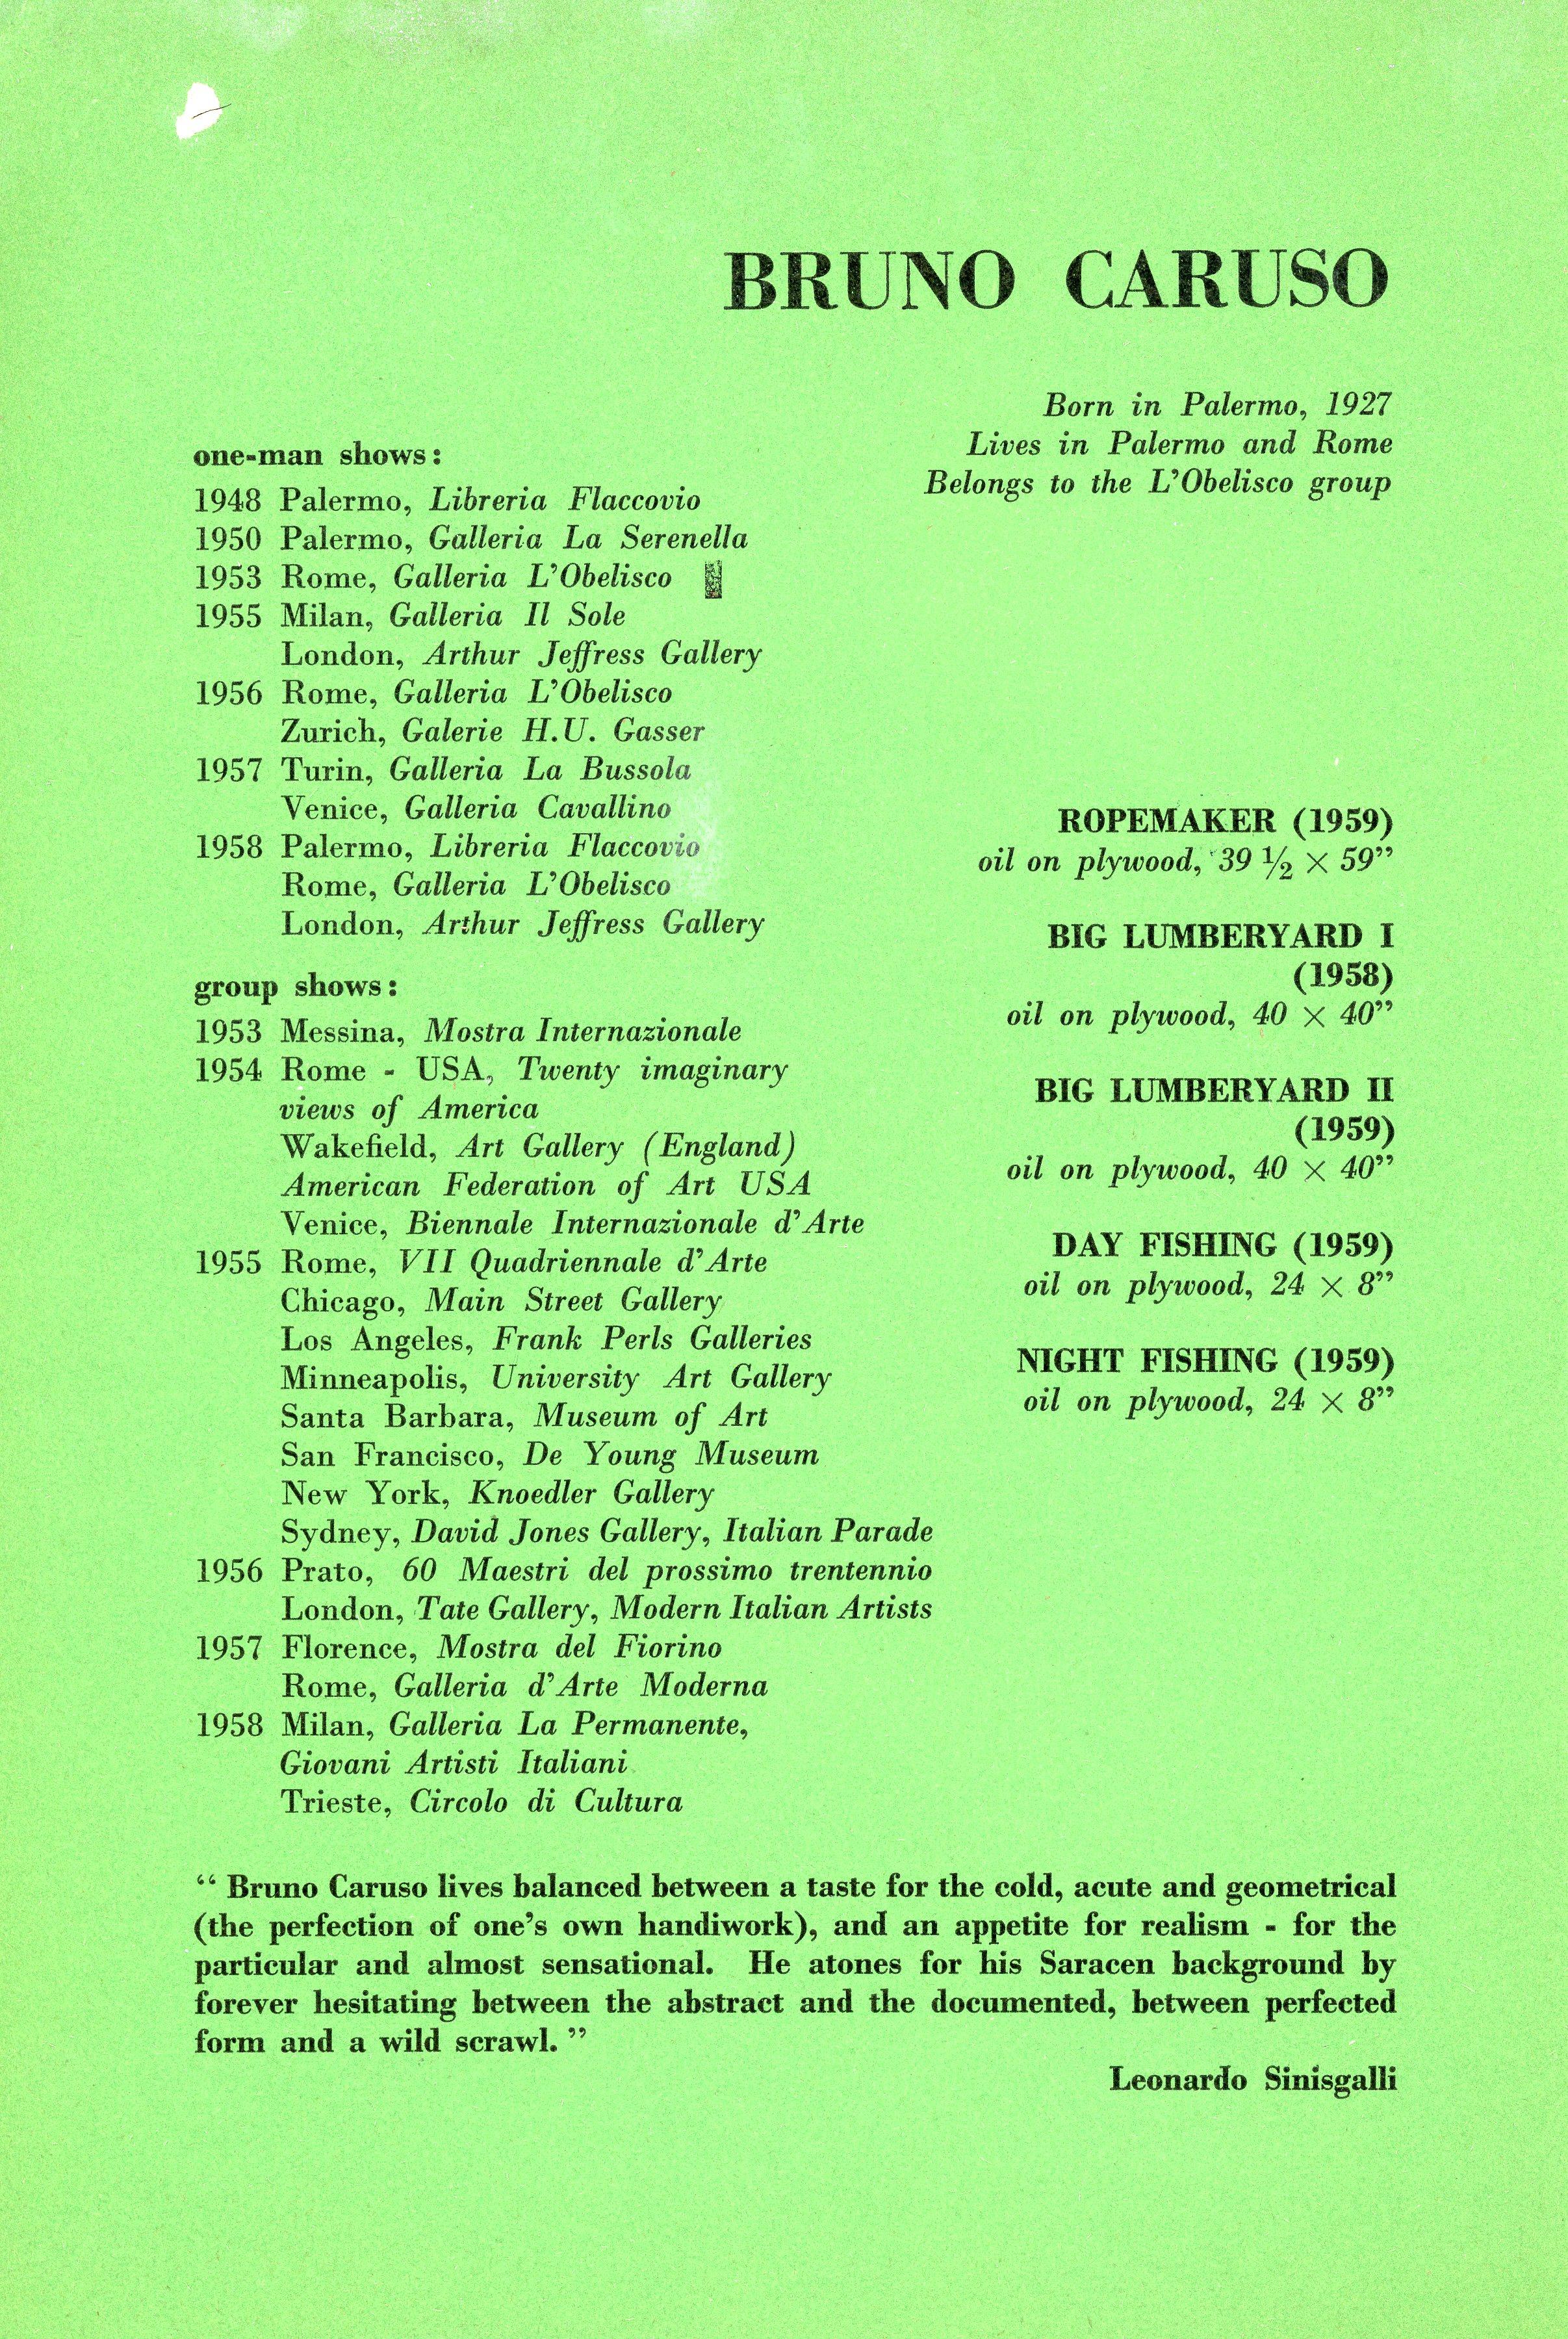 1959-04 Italy Three Directions - Bruno Caruso_03.jpg